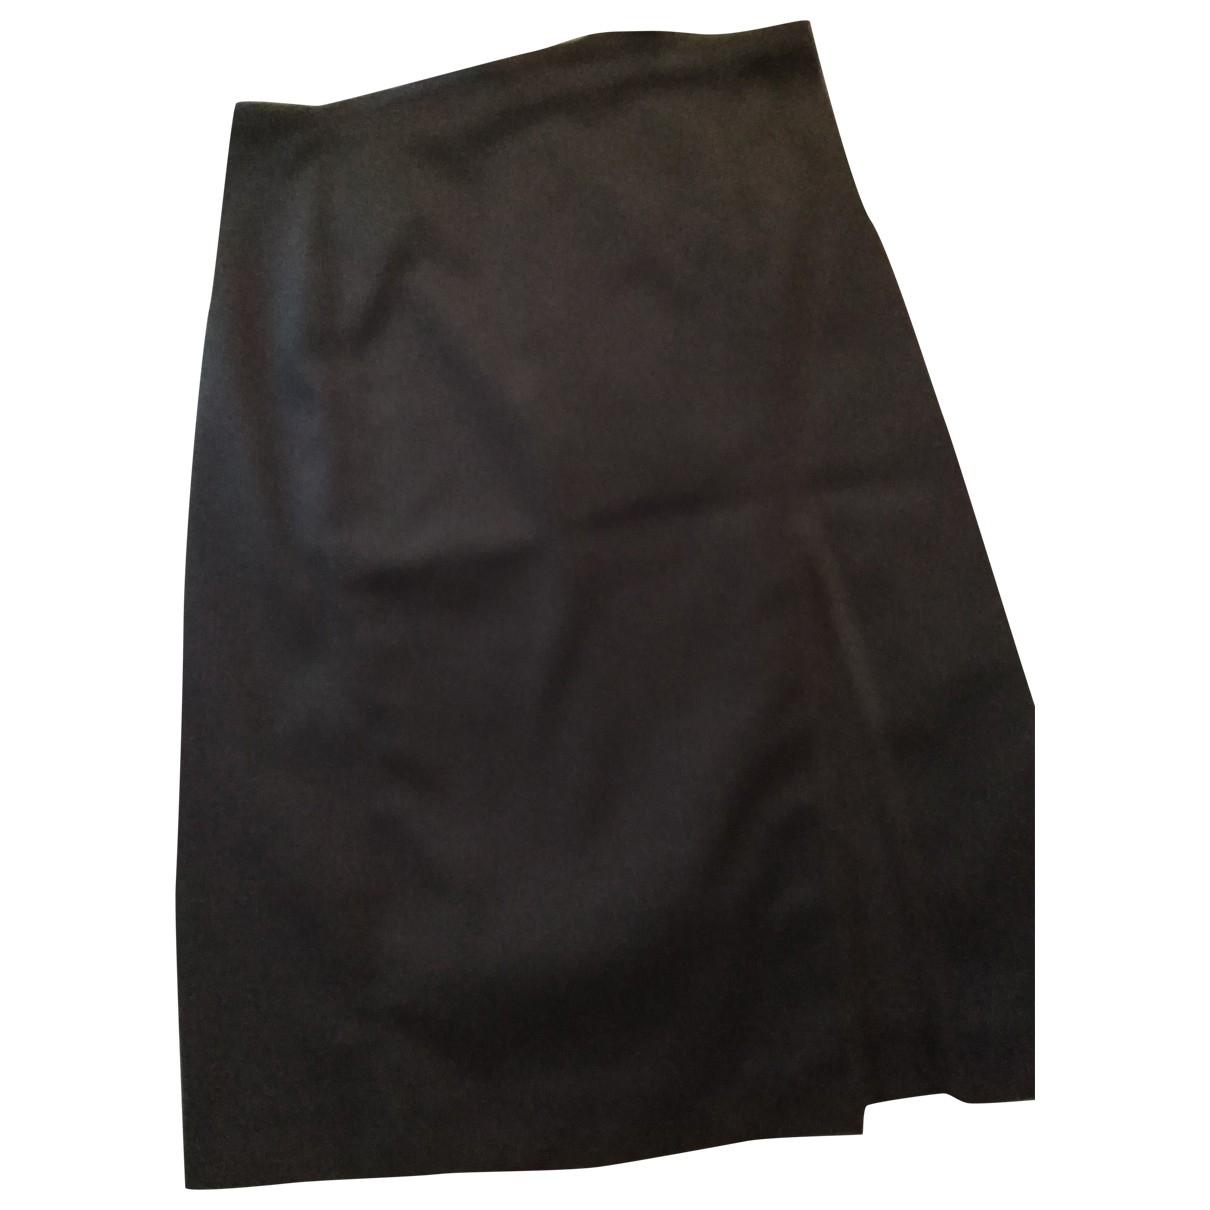 Gucci \N Black Cotton - elasthane skirt for Women 44 IT